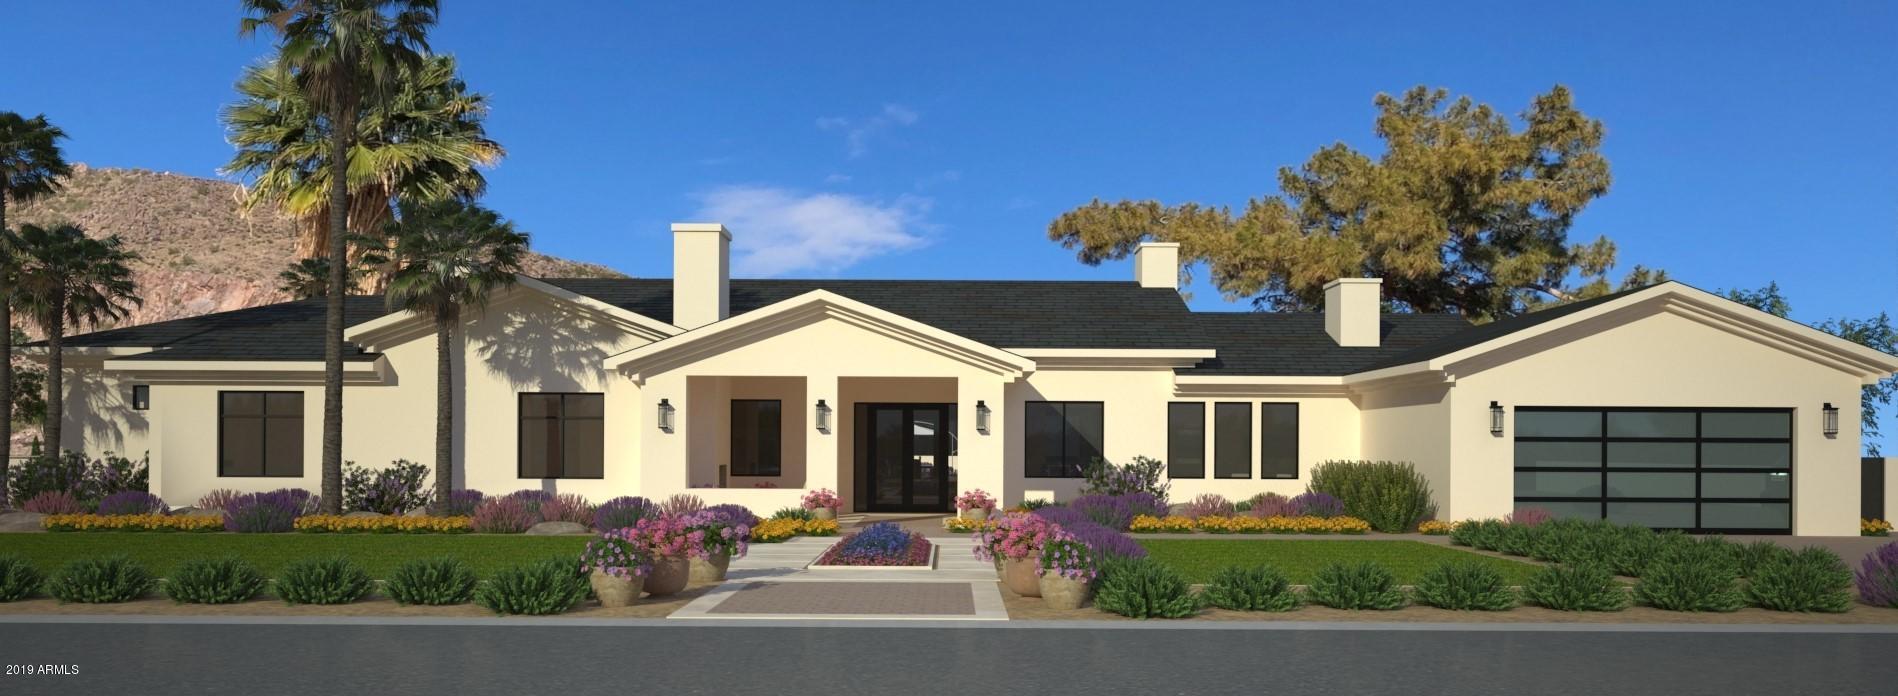 Photo of 6246 E Hillcrest Boulevard, Scottsdale, AZ 85251